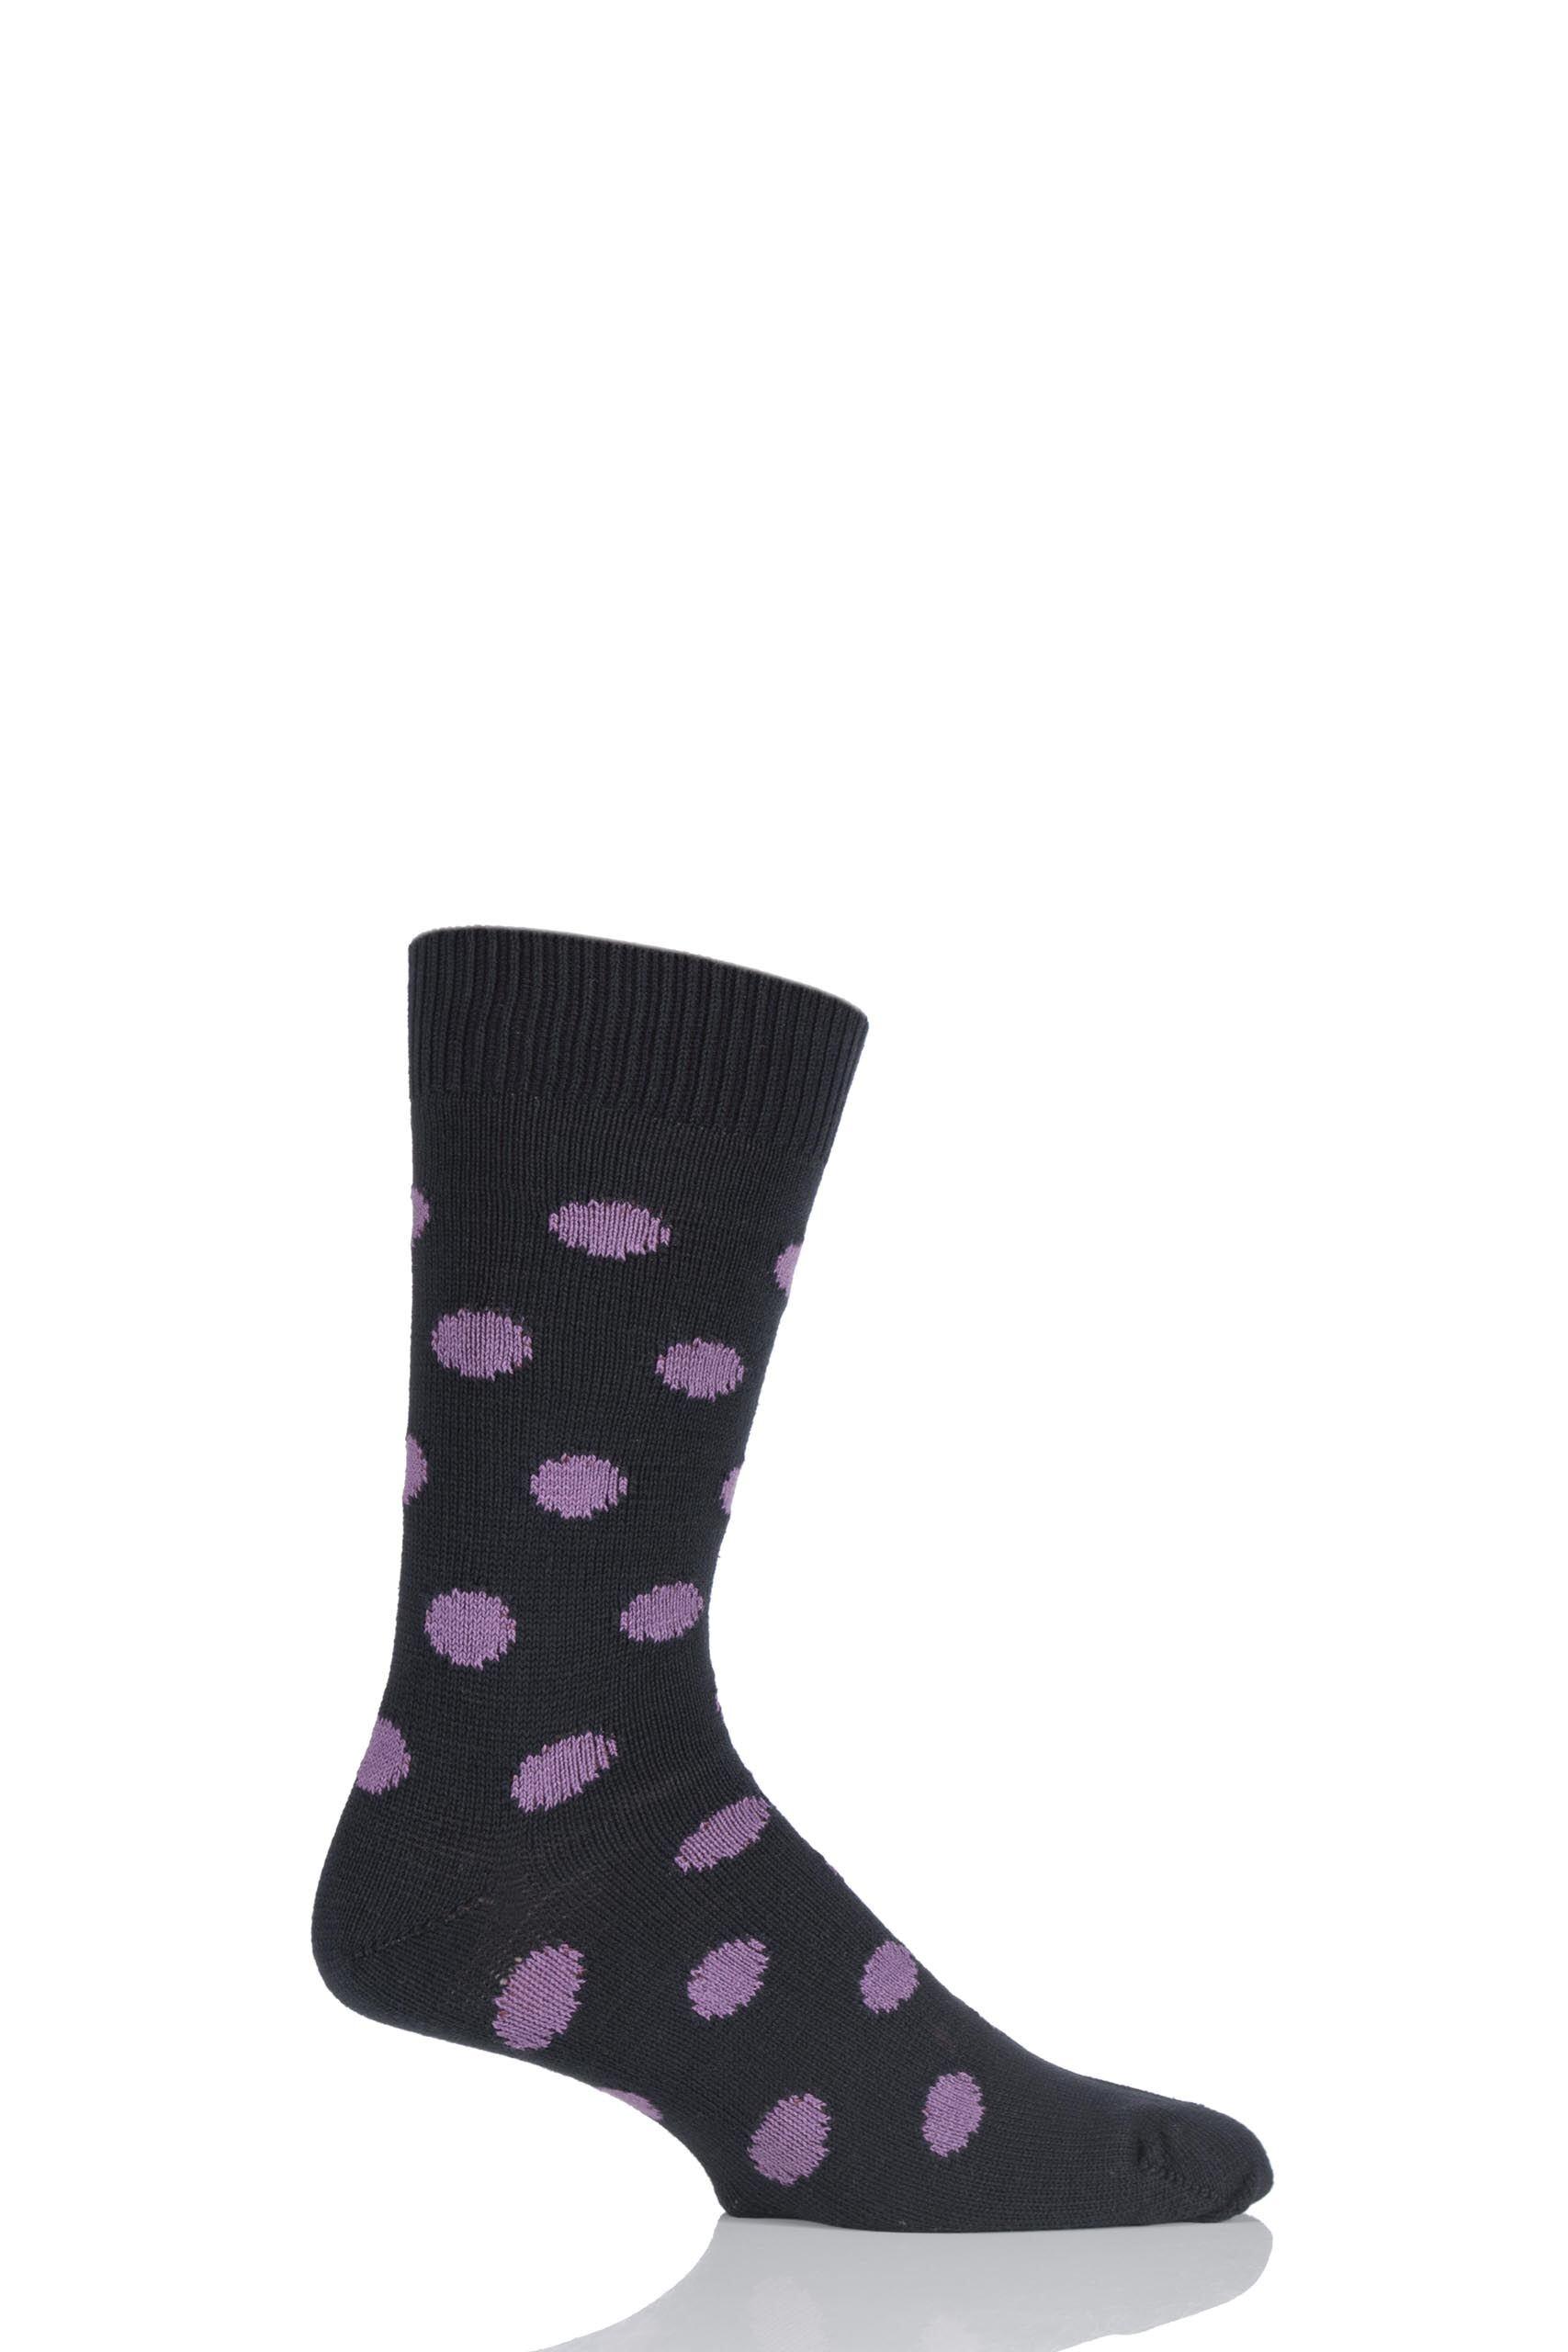 Image of 1 Pair Black / Plum 6 Gauge Cotton Spot Design Socks Men's 7-11 Mens - Pringle of Scotland